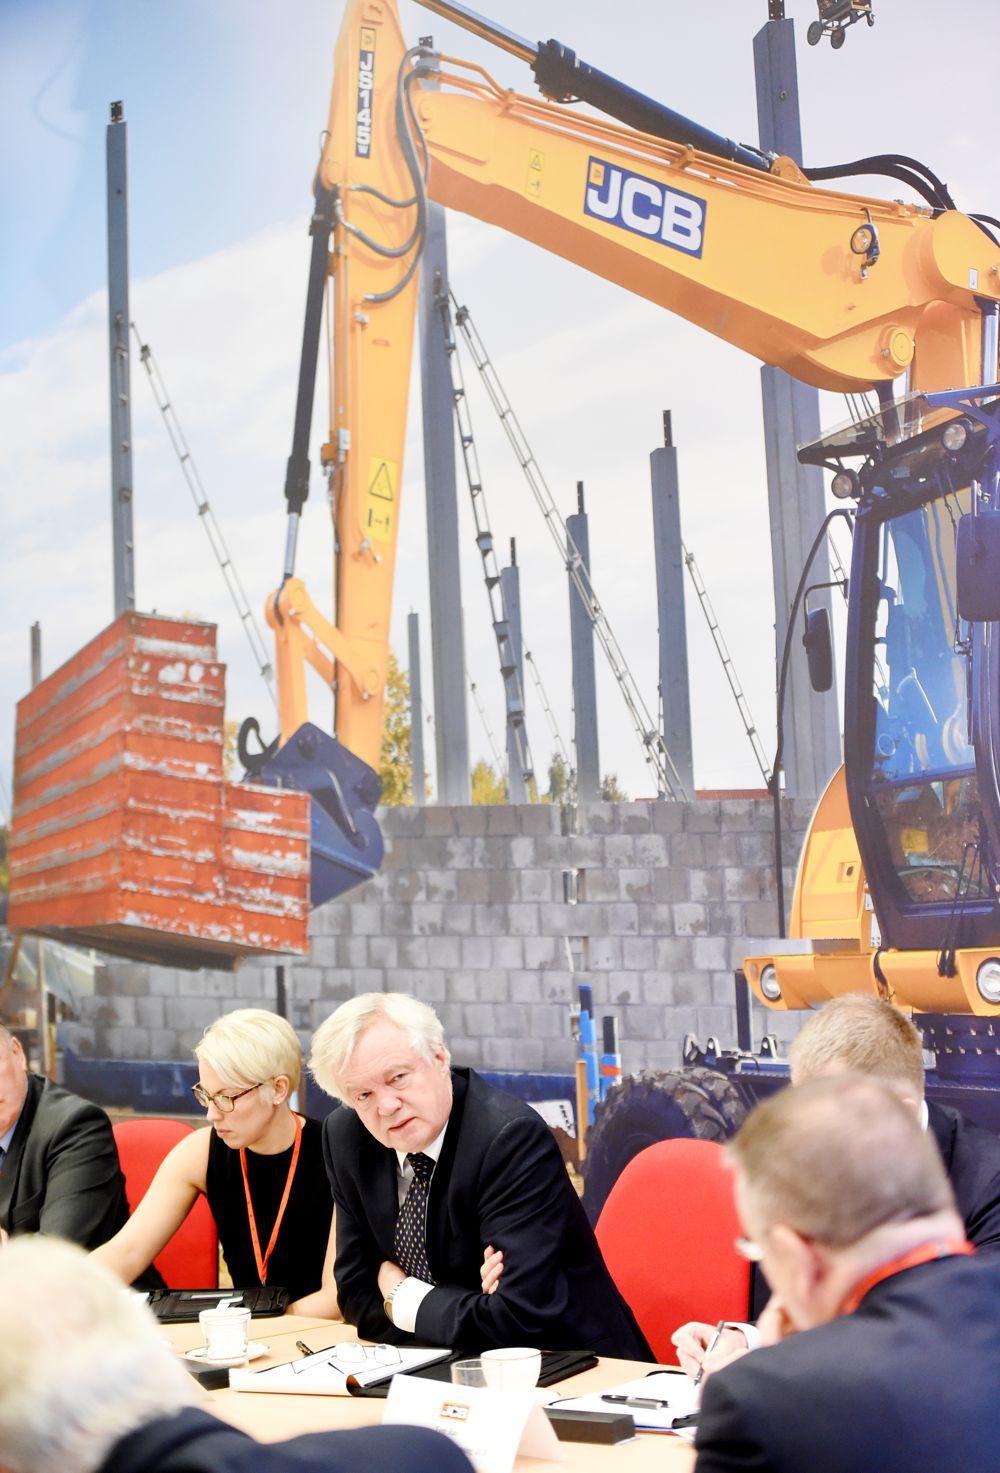 David Davis visits JCB to reassure British business as Brexit talks enter key stage